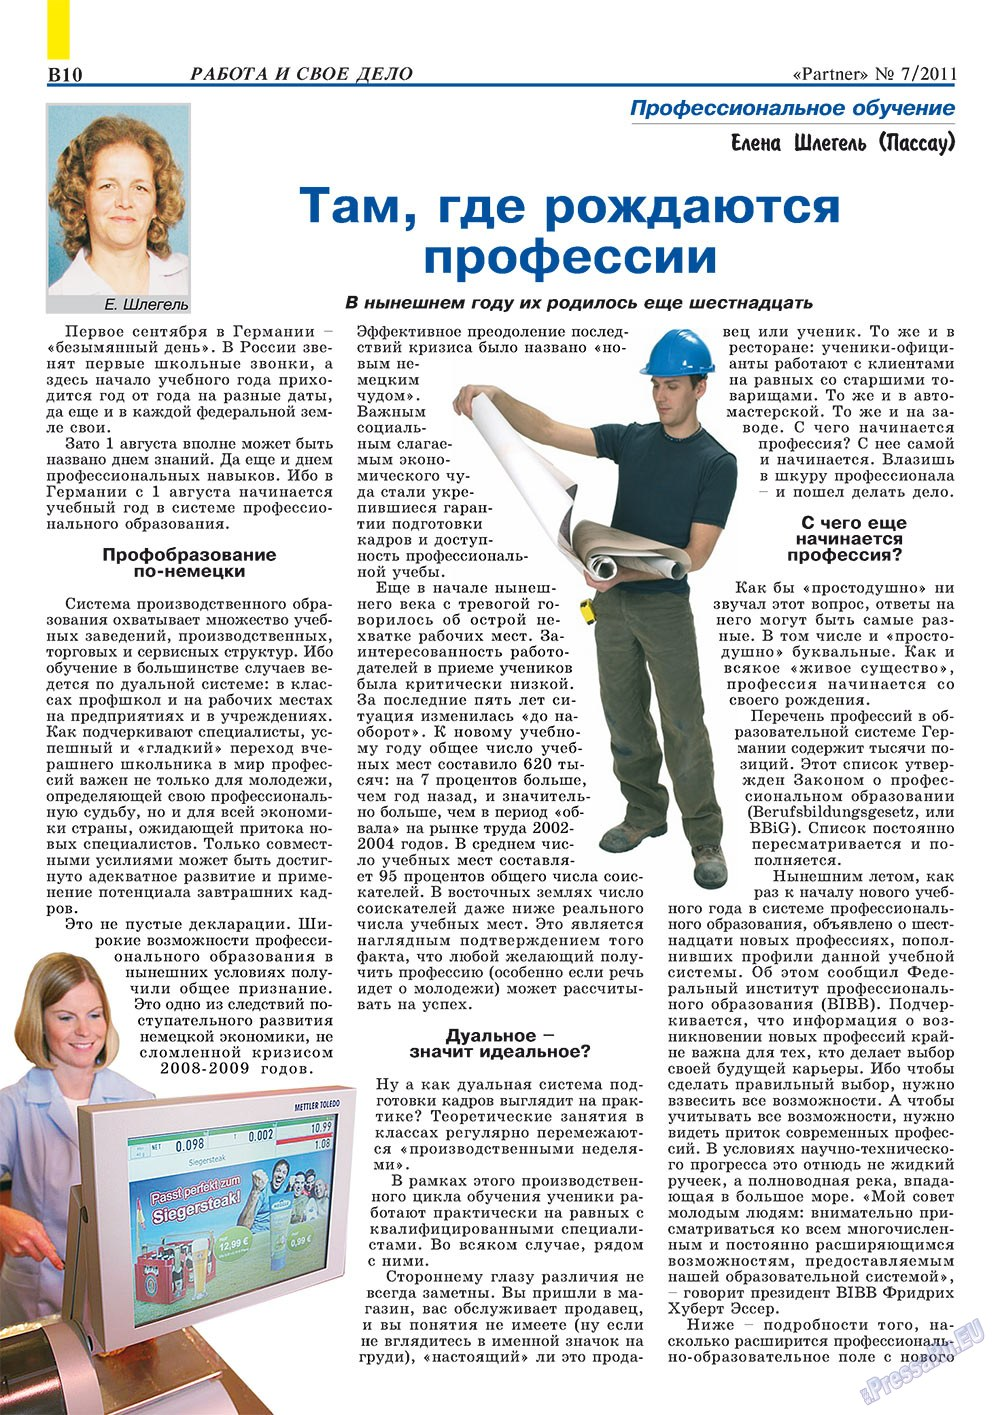 Партнер-север (журнал). 2011 год, номер 7, стр. 20